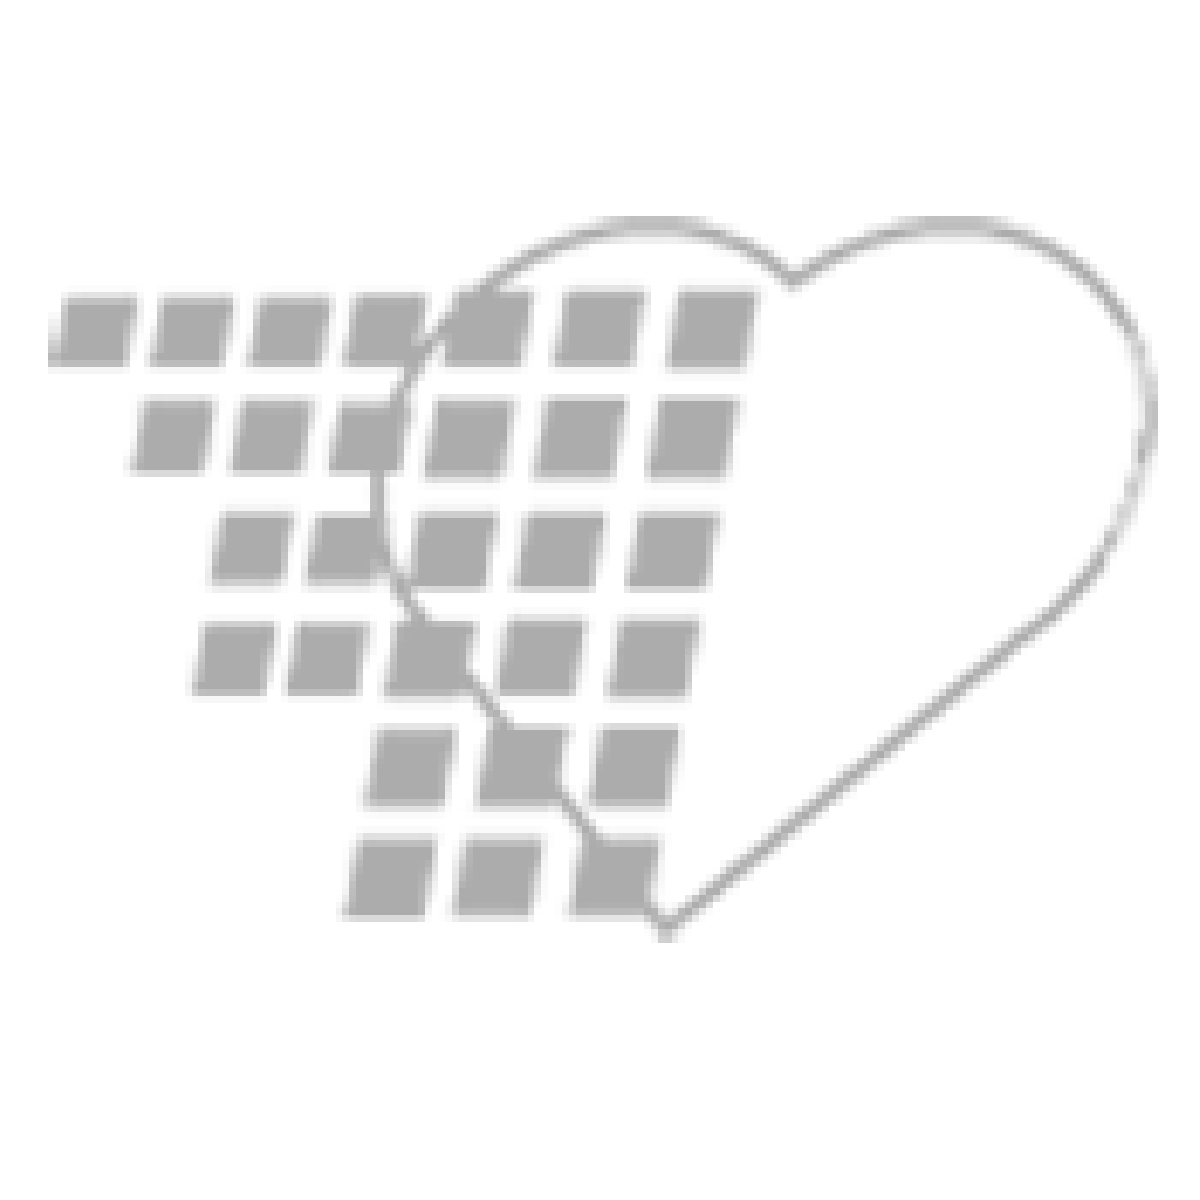 07-07-5604 DeVilbiss Healthcare Suction Tubing Kit